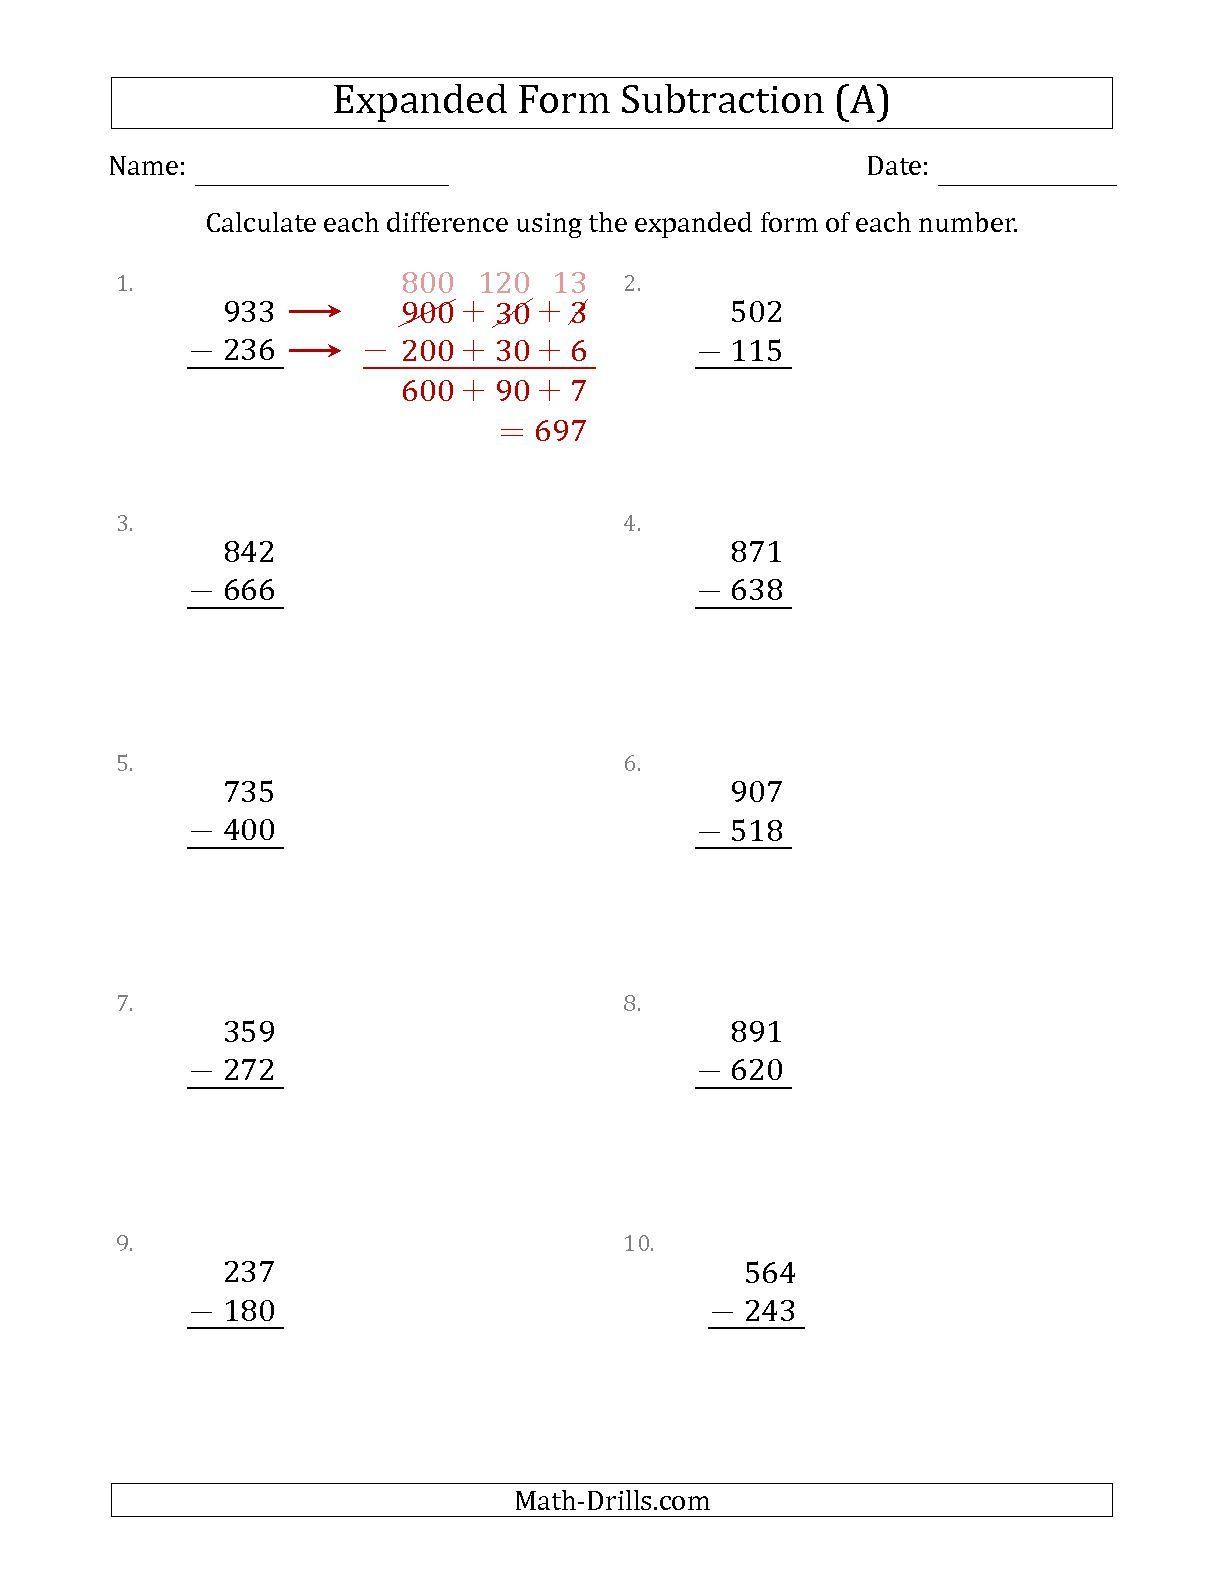 The 3 digit expanded form subtraction a math worksheet from the the 3 digit expanded form subtraction a math worksheet from the subtraction worksheets falaconquin